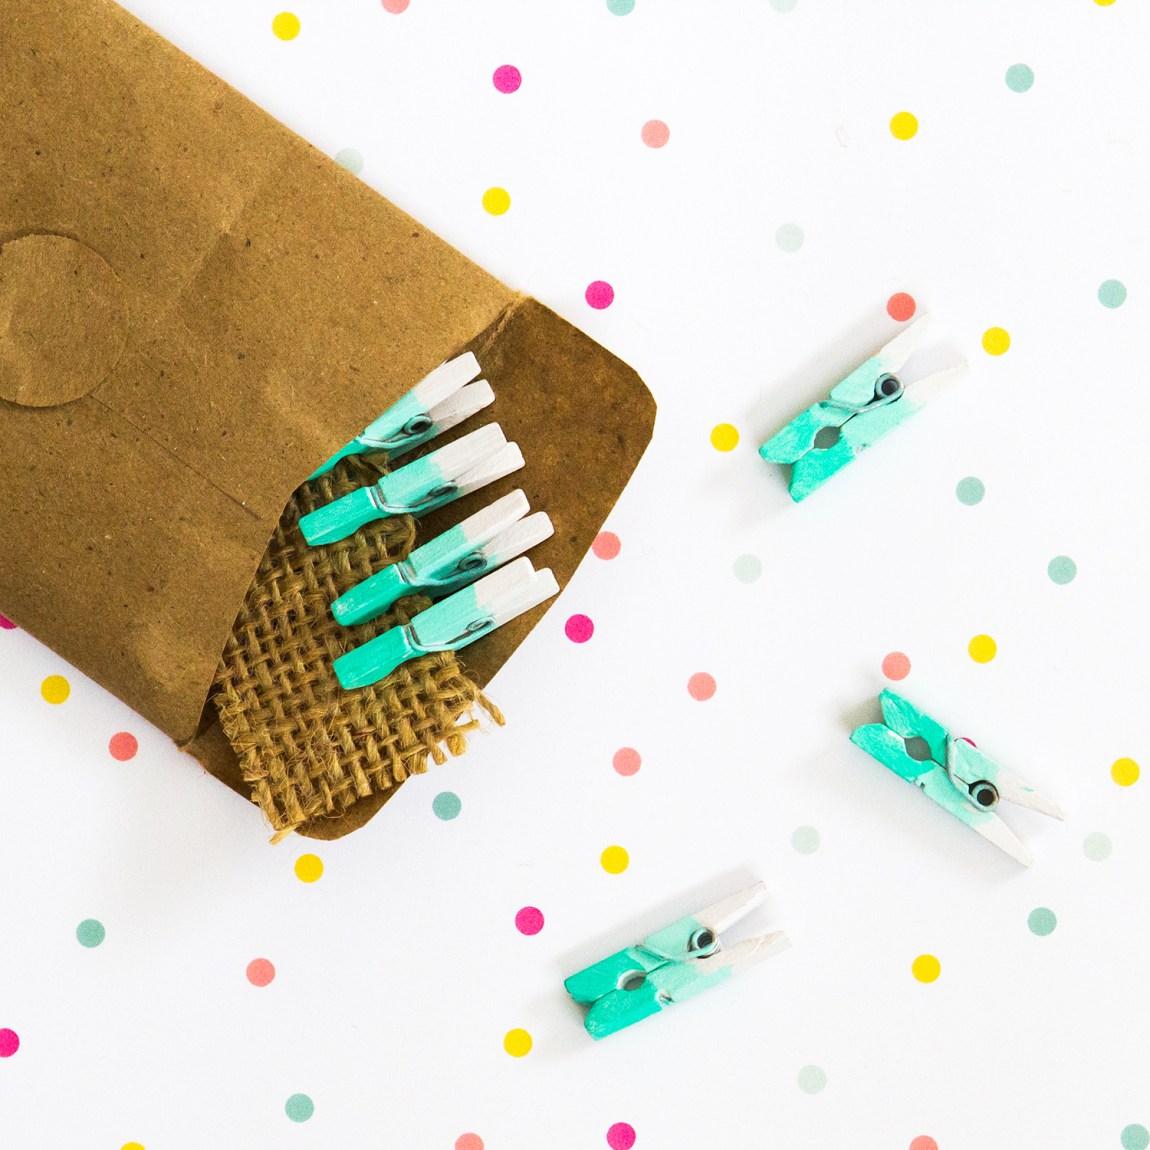 Tiny mini ombre clothespins by Mona Mini Treasure.